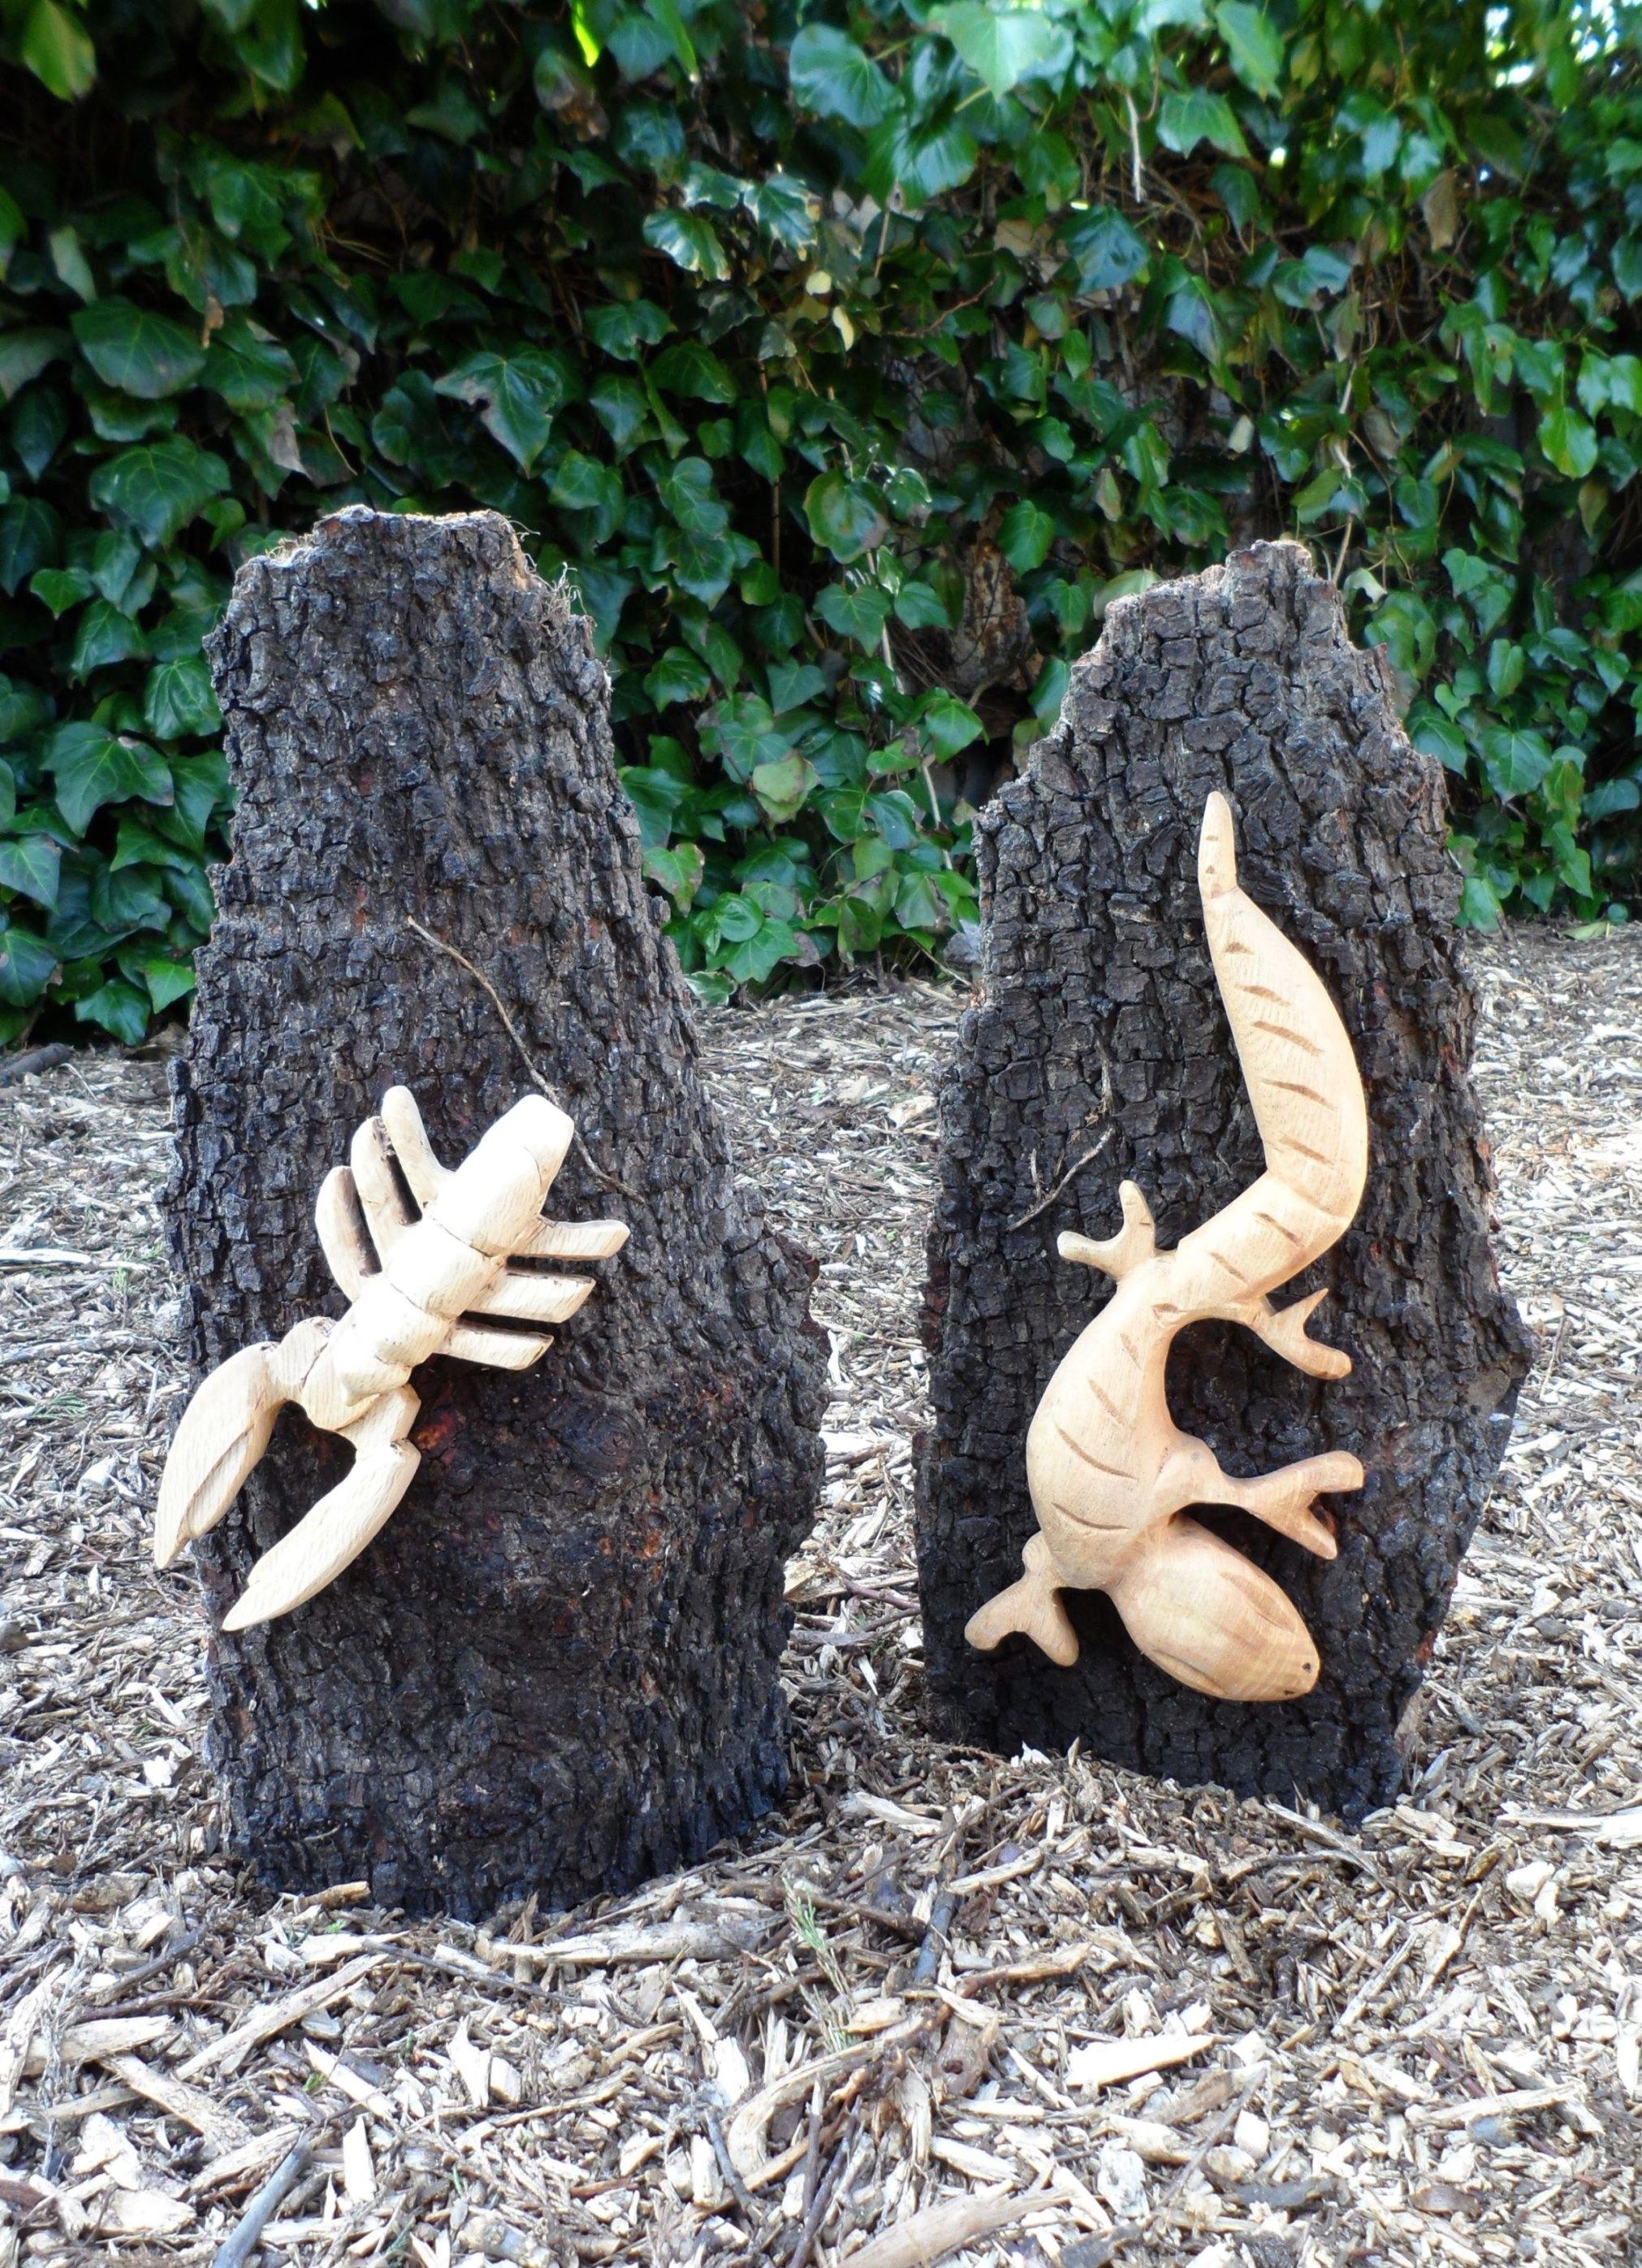 045 Scorpion and Lizard.JPG